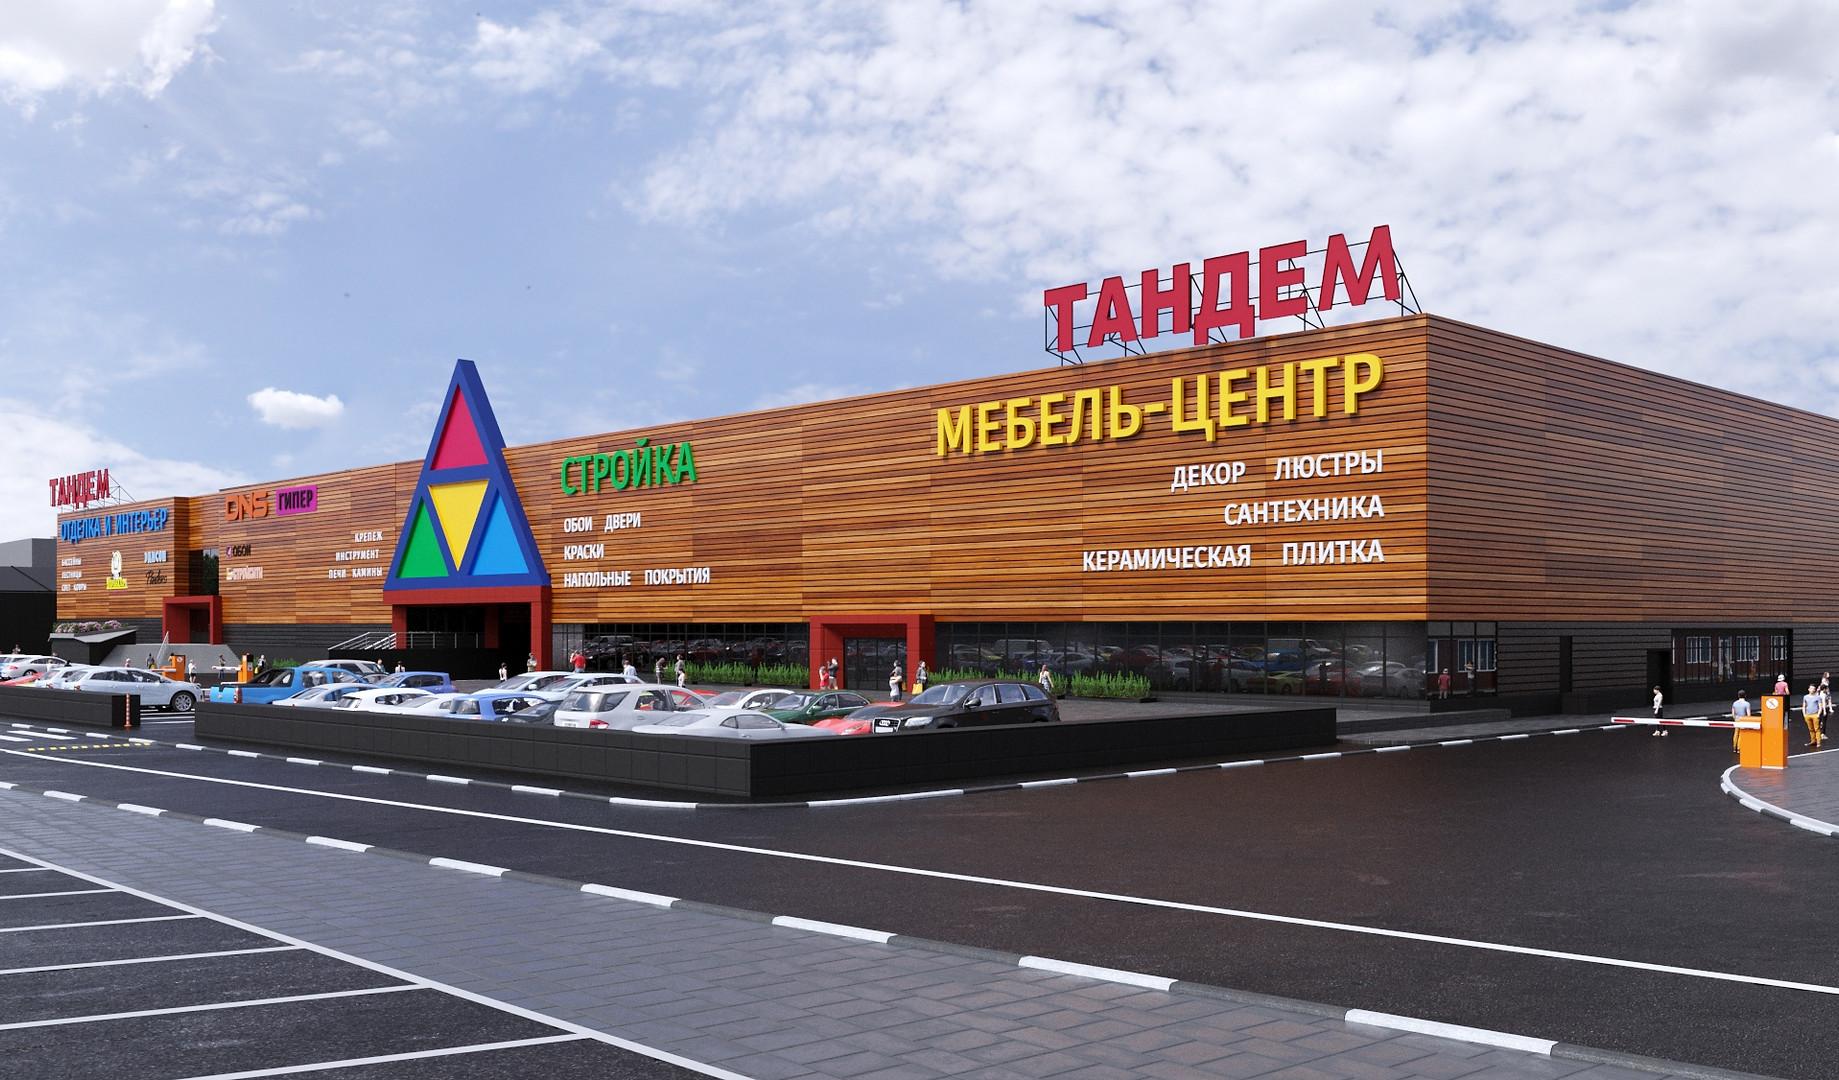 ТЦ Тандем во Владимире